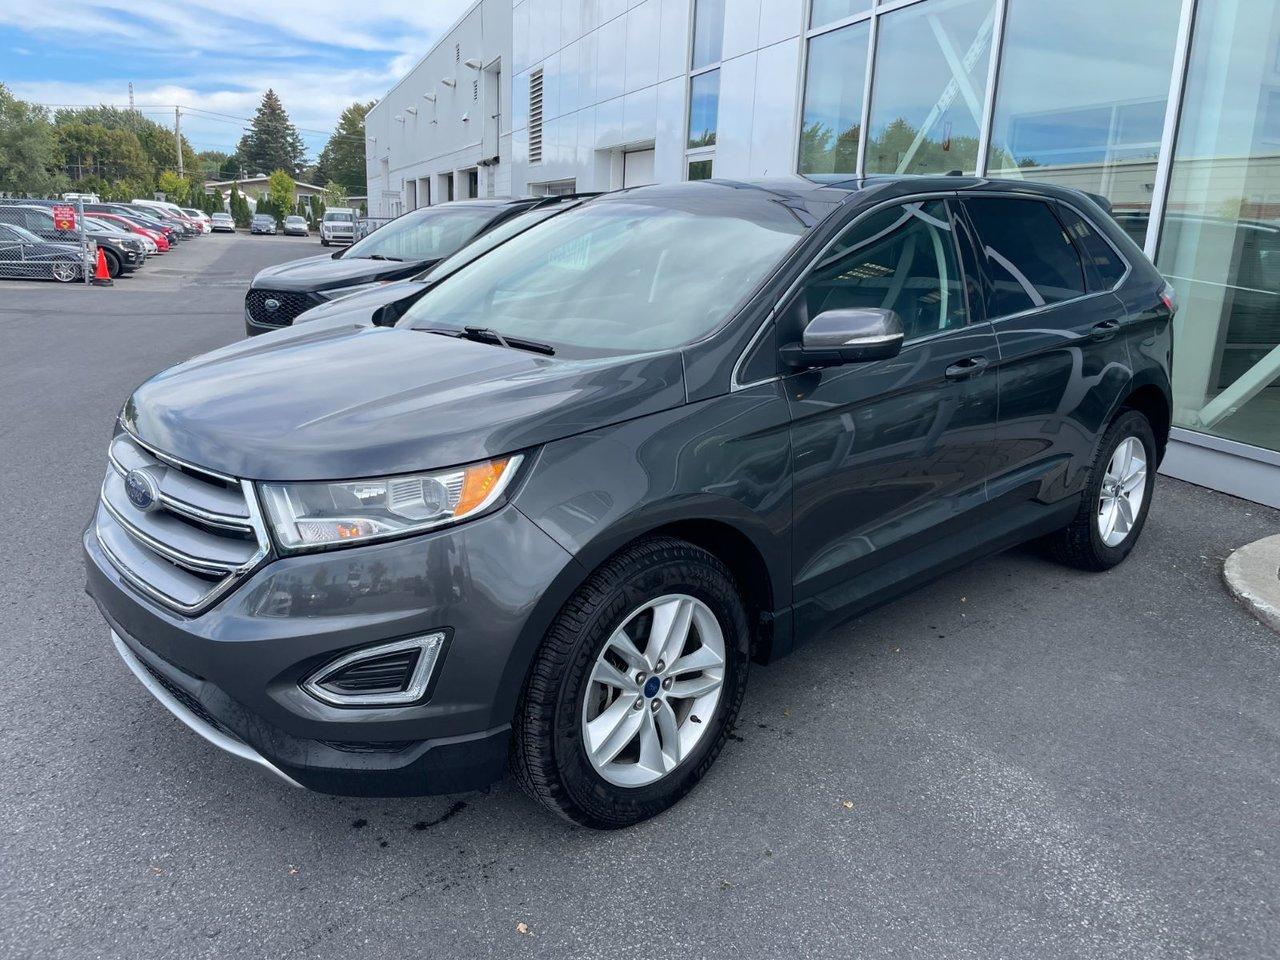 2018 Ford Edge SEL V6 3.5L AWD - TOIT PANO, CUIR, HITCH, GPS